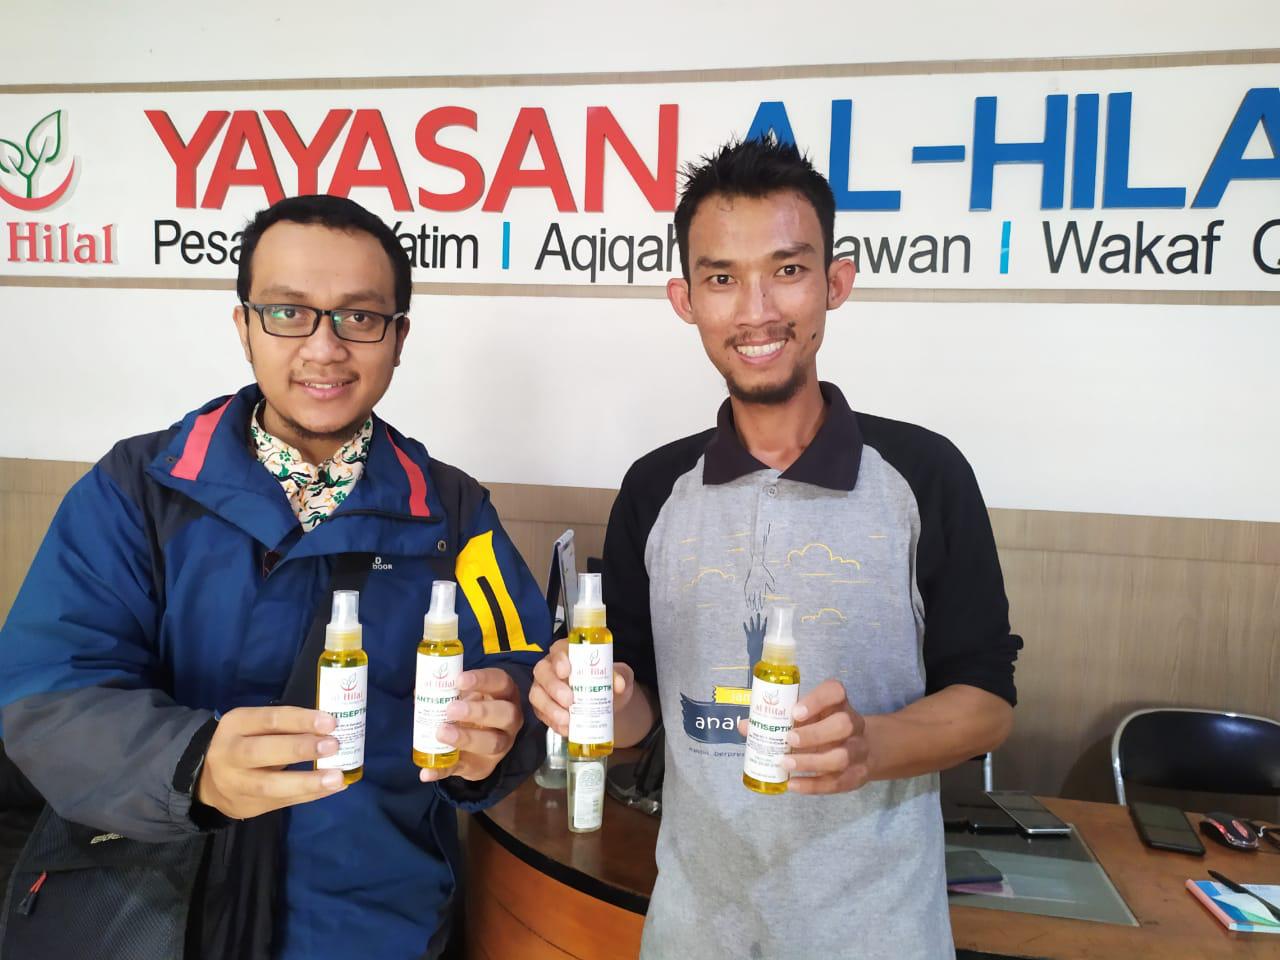 Pembagian Hand Sanitizer Oleh LAZ al-Hilal 2